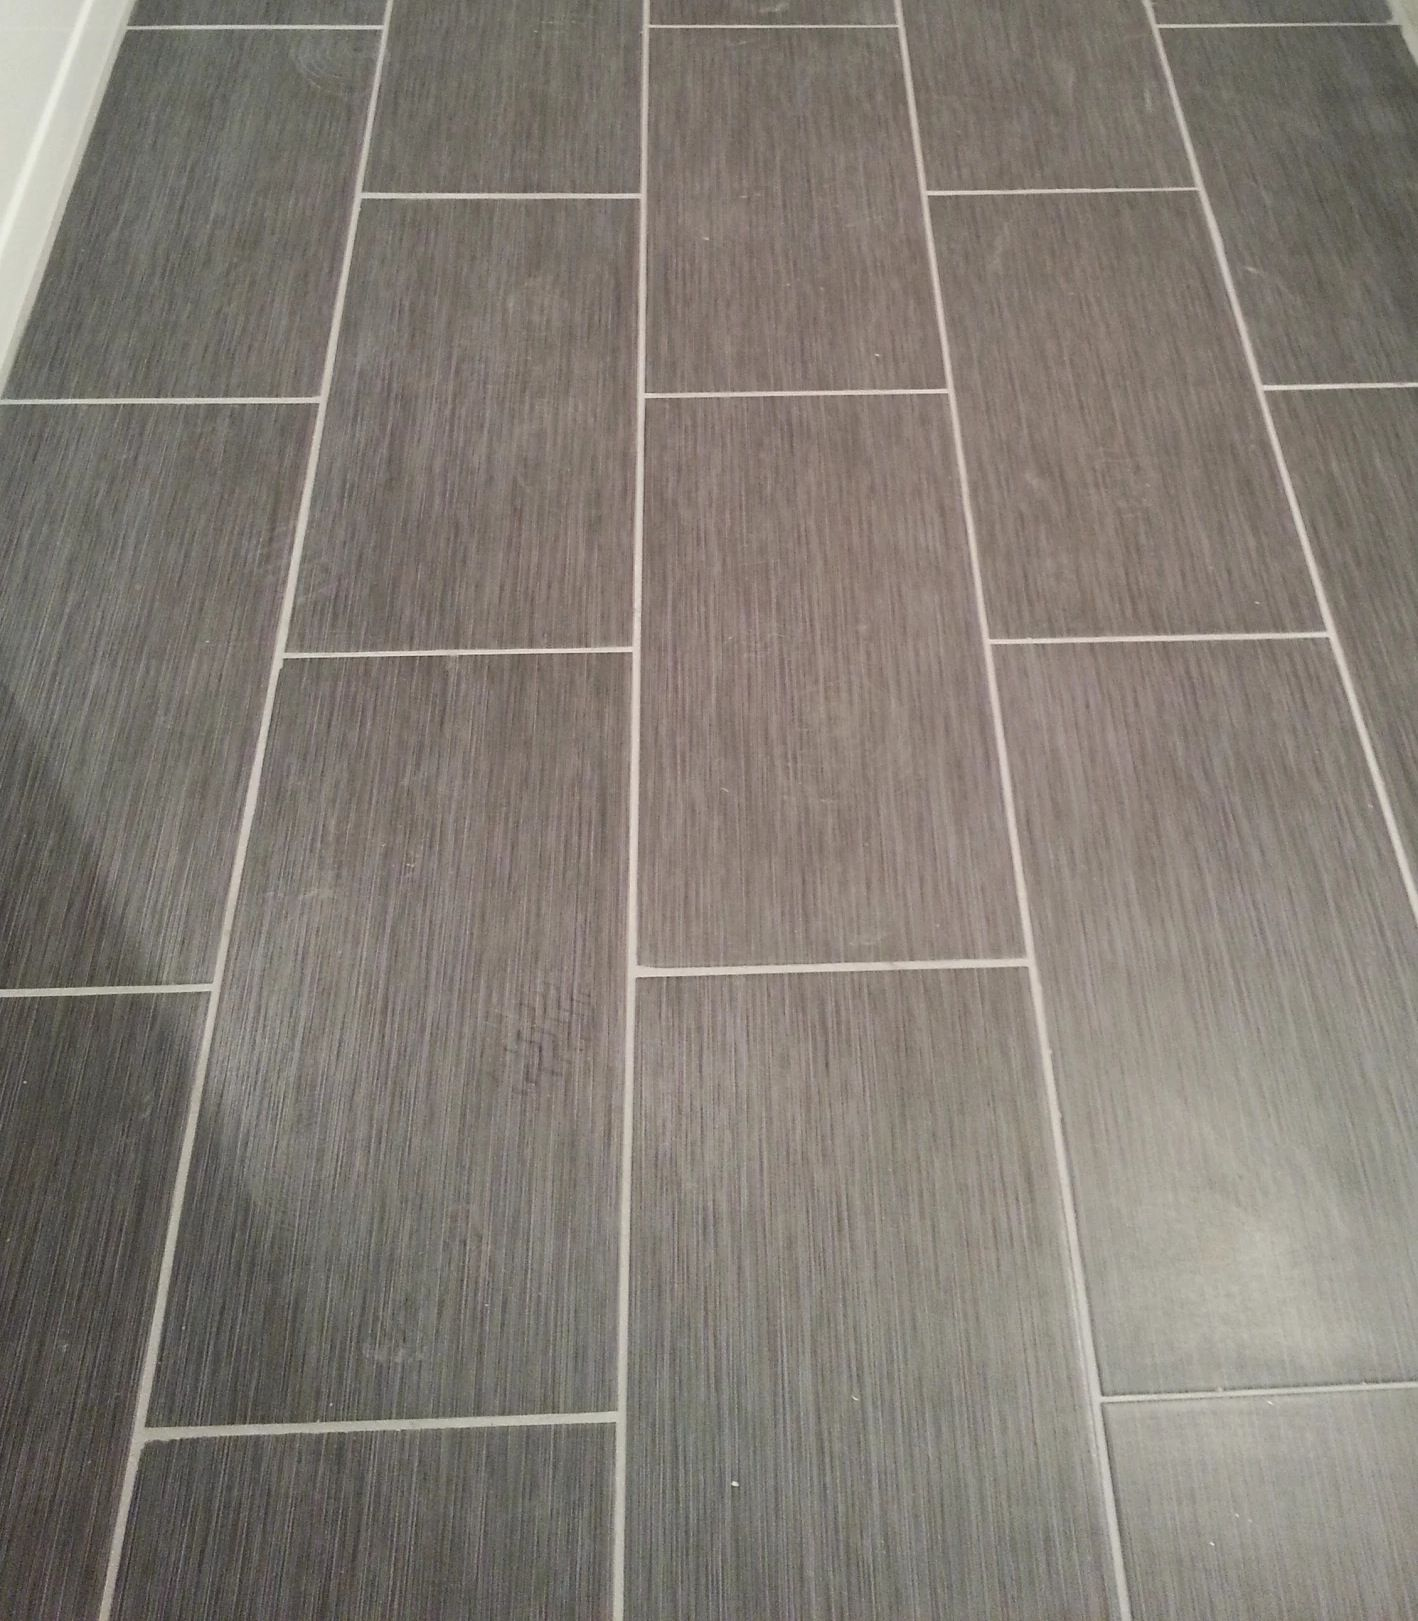 home depot kitchen floor tile touch faucet metro gris 12x24 in my bathroom